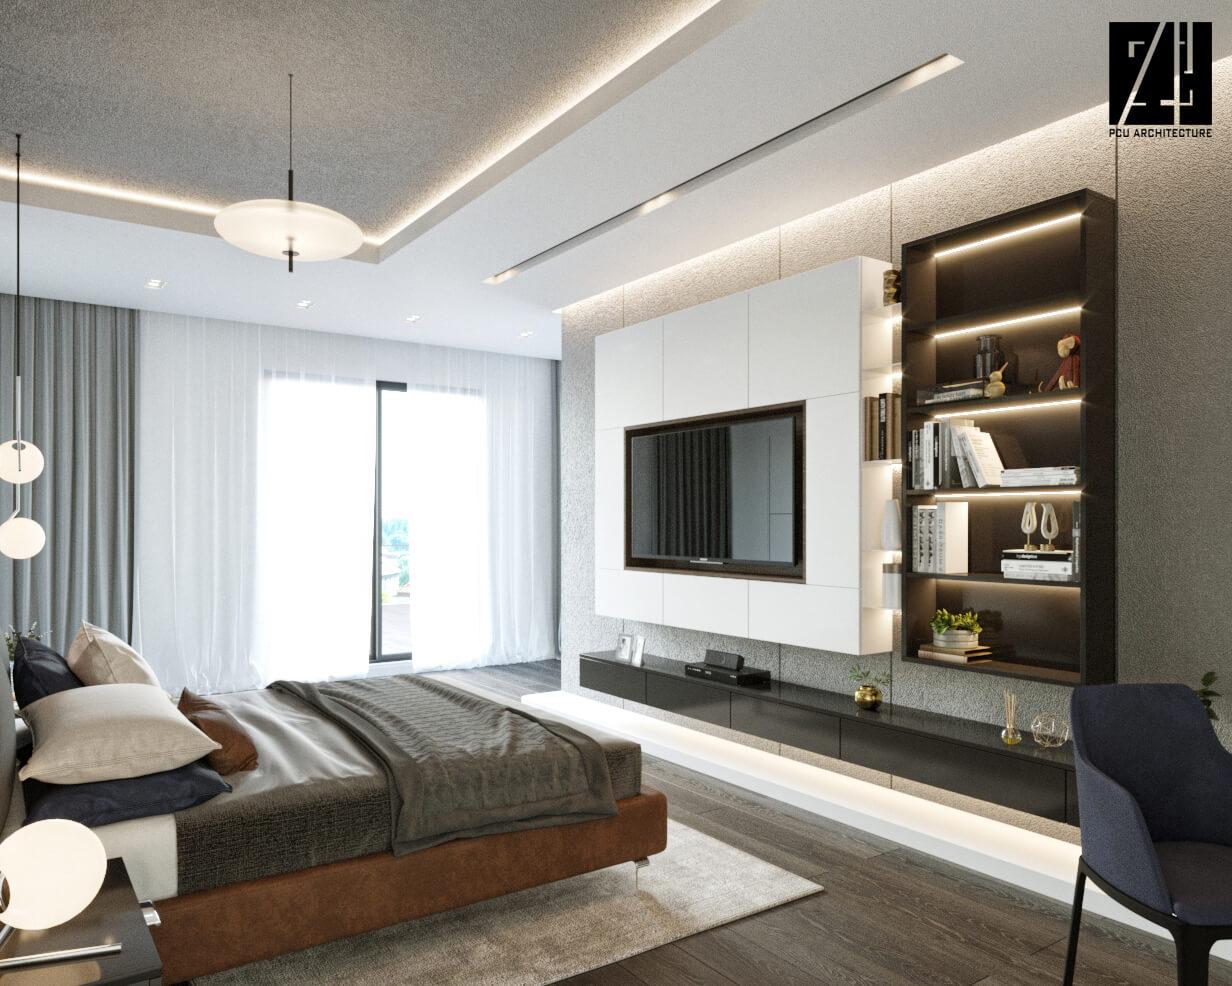 04_DI_CASA 1_BUZAU_Dormitor_Matrimonial_4